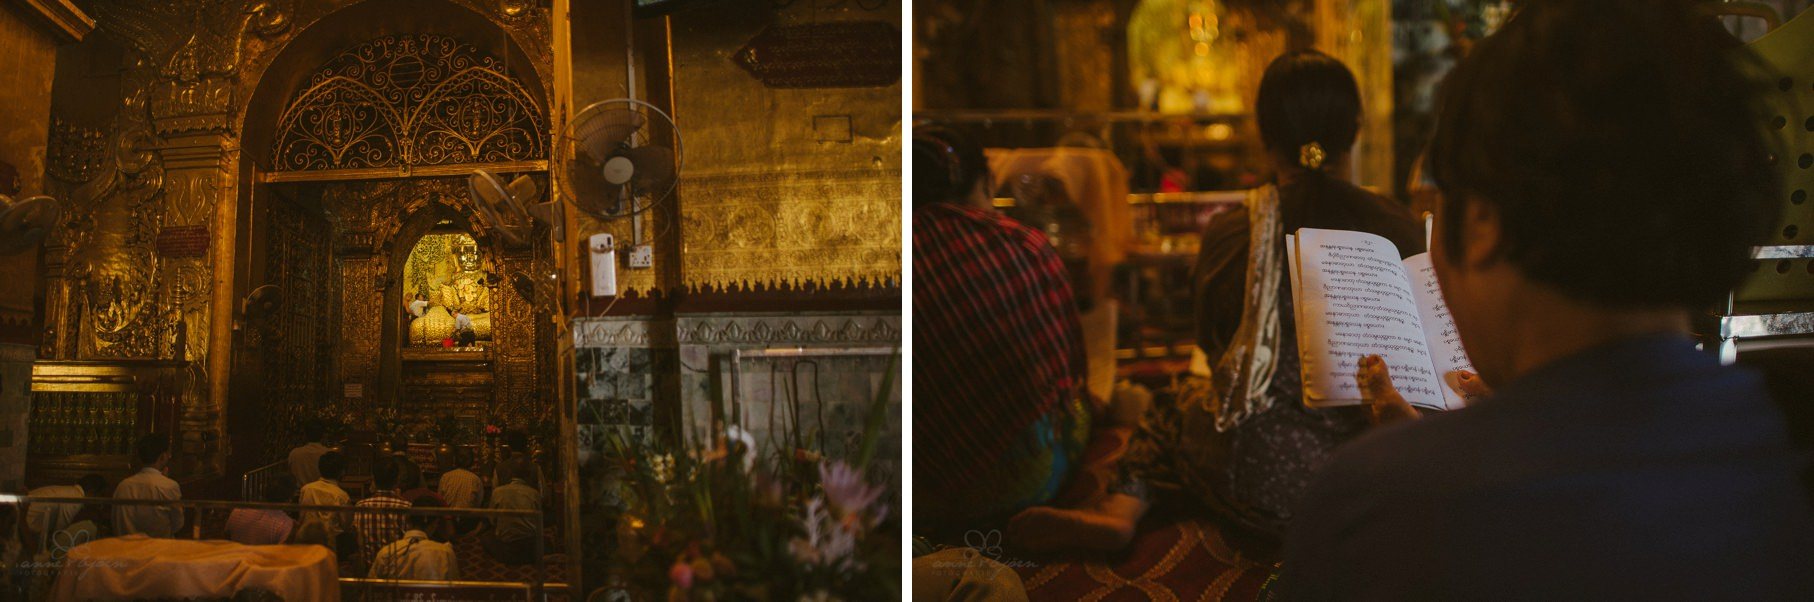 0056 yangon mandalay d76 6929 - Großstädte Myanmars - Yangon & Mandalay